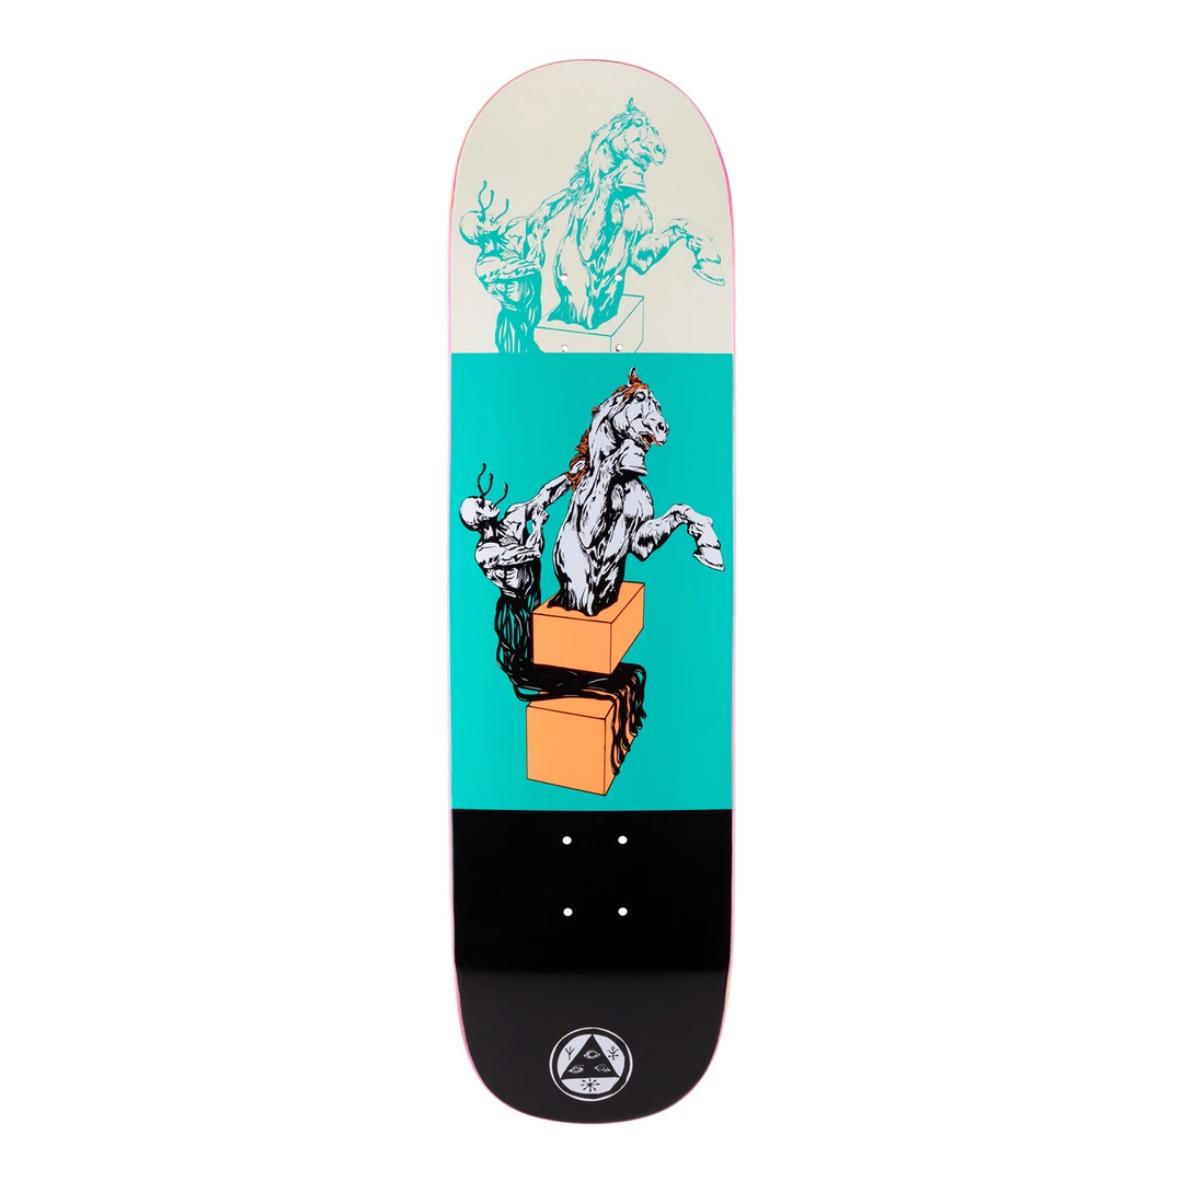 "Welcome Skateboards Hierophant on Big Bunyip 8.5"" Teal/Black"